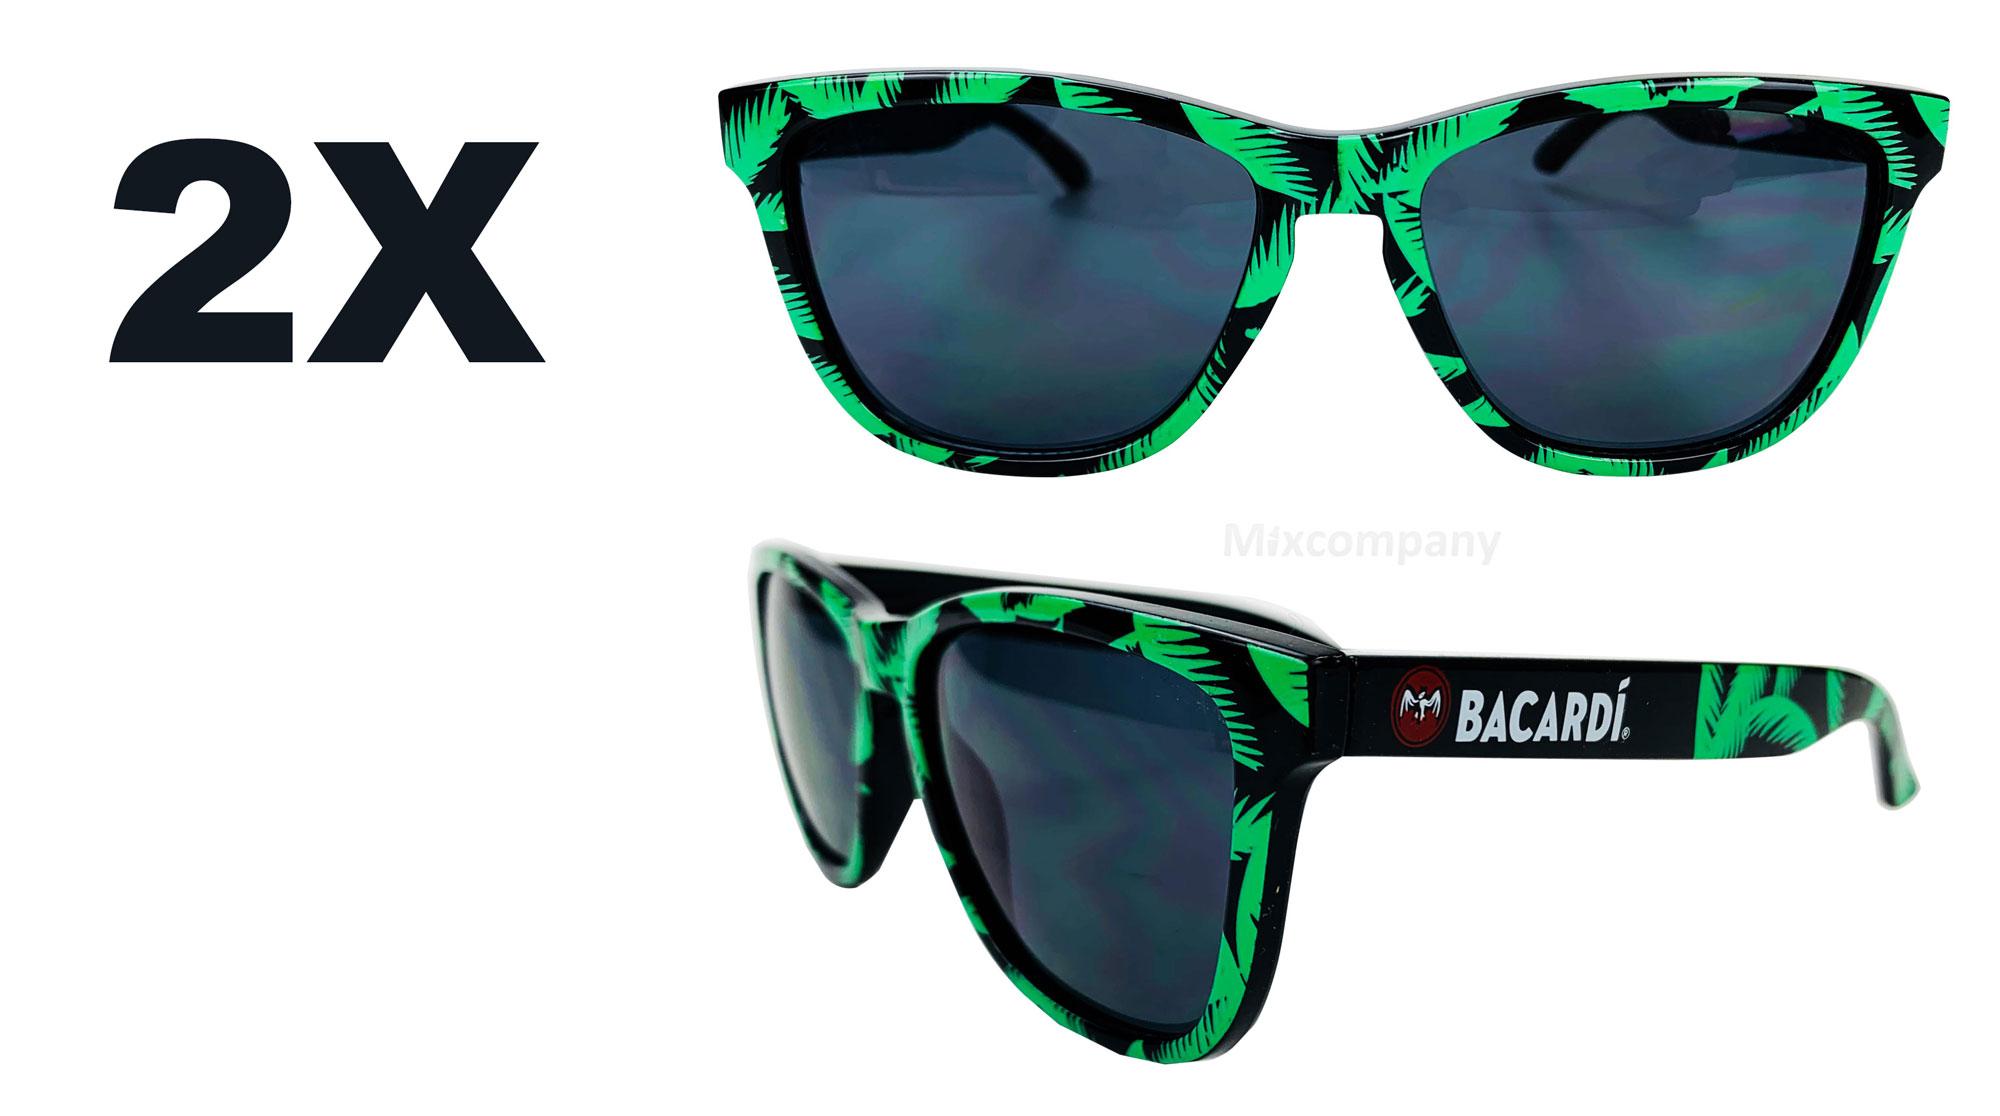 Bacardi Rum Nerd Sonnenbrille mit Palmenmuster grün UV400 Set - 2 Stück Unisex Retro Vintage Style Party Festival Bar